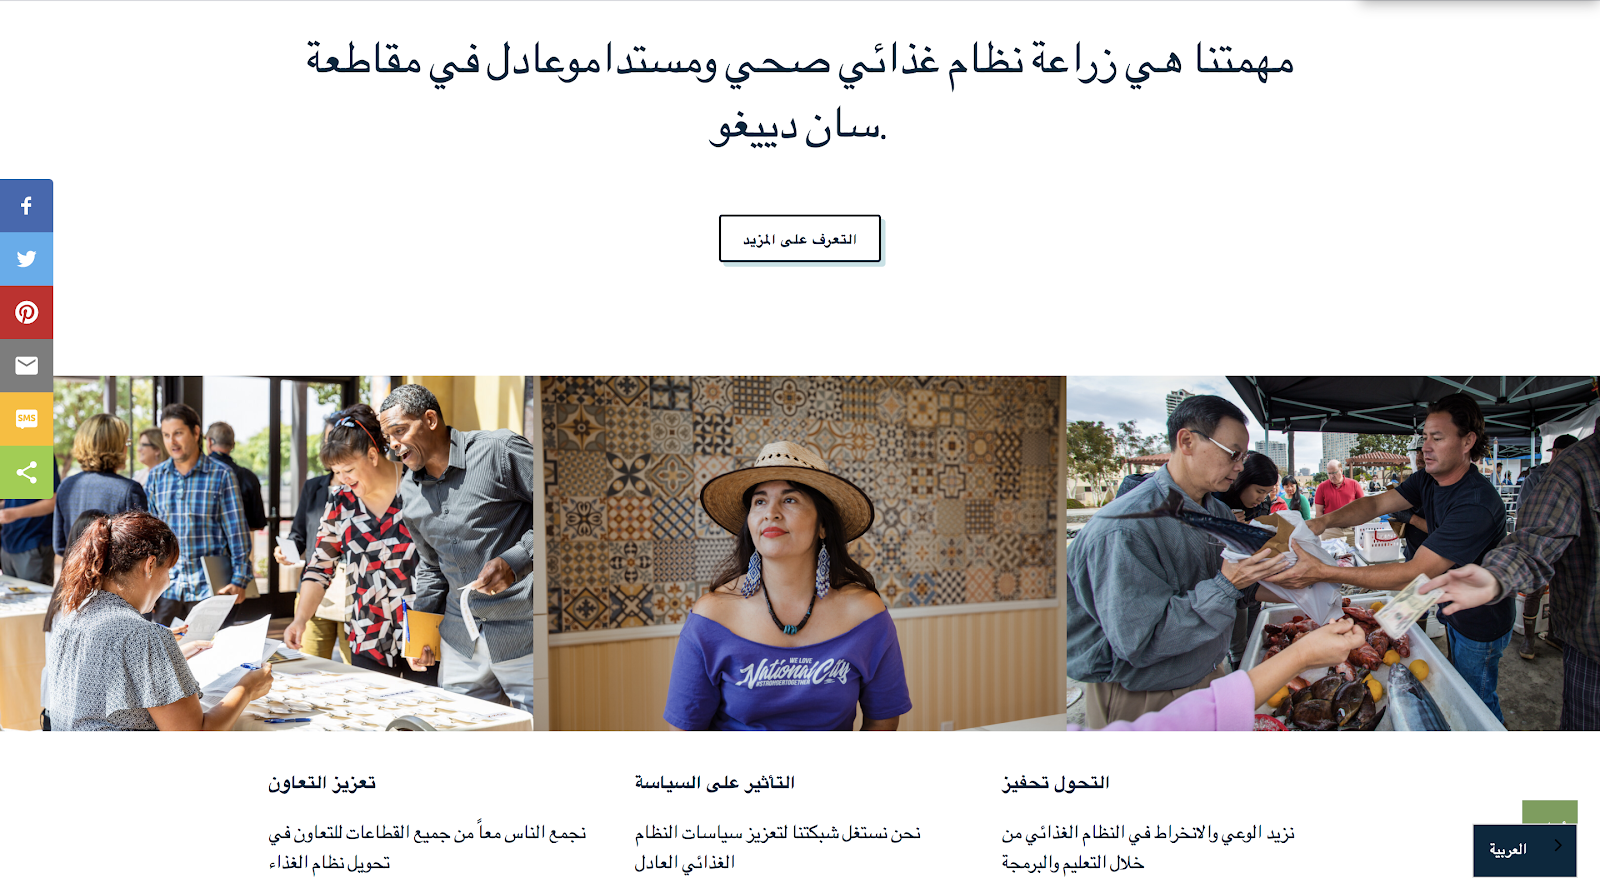 Multilingual Website Example: San Diego Food System Alliance Website in Arabic